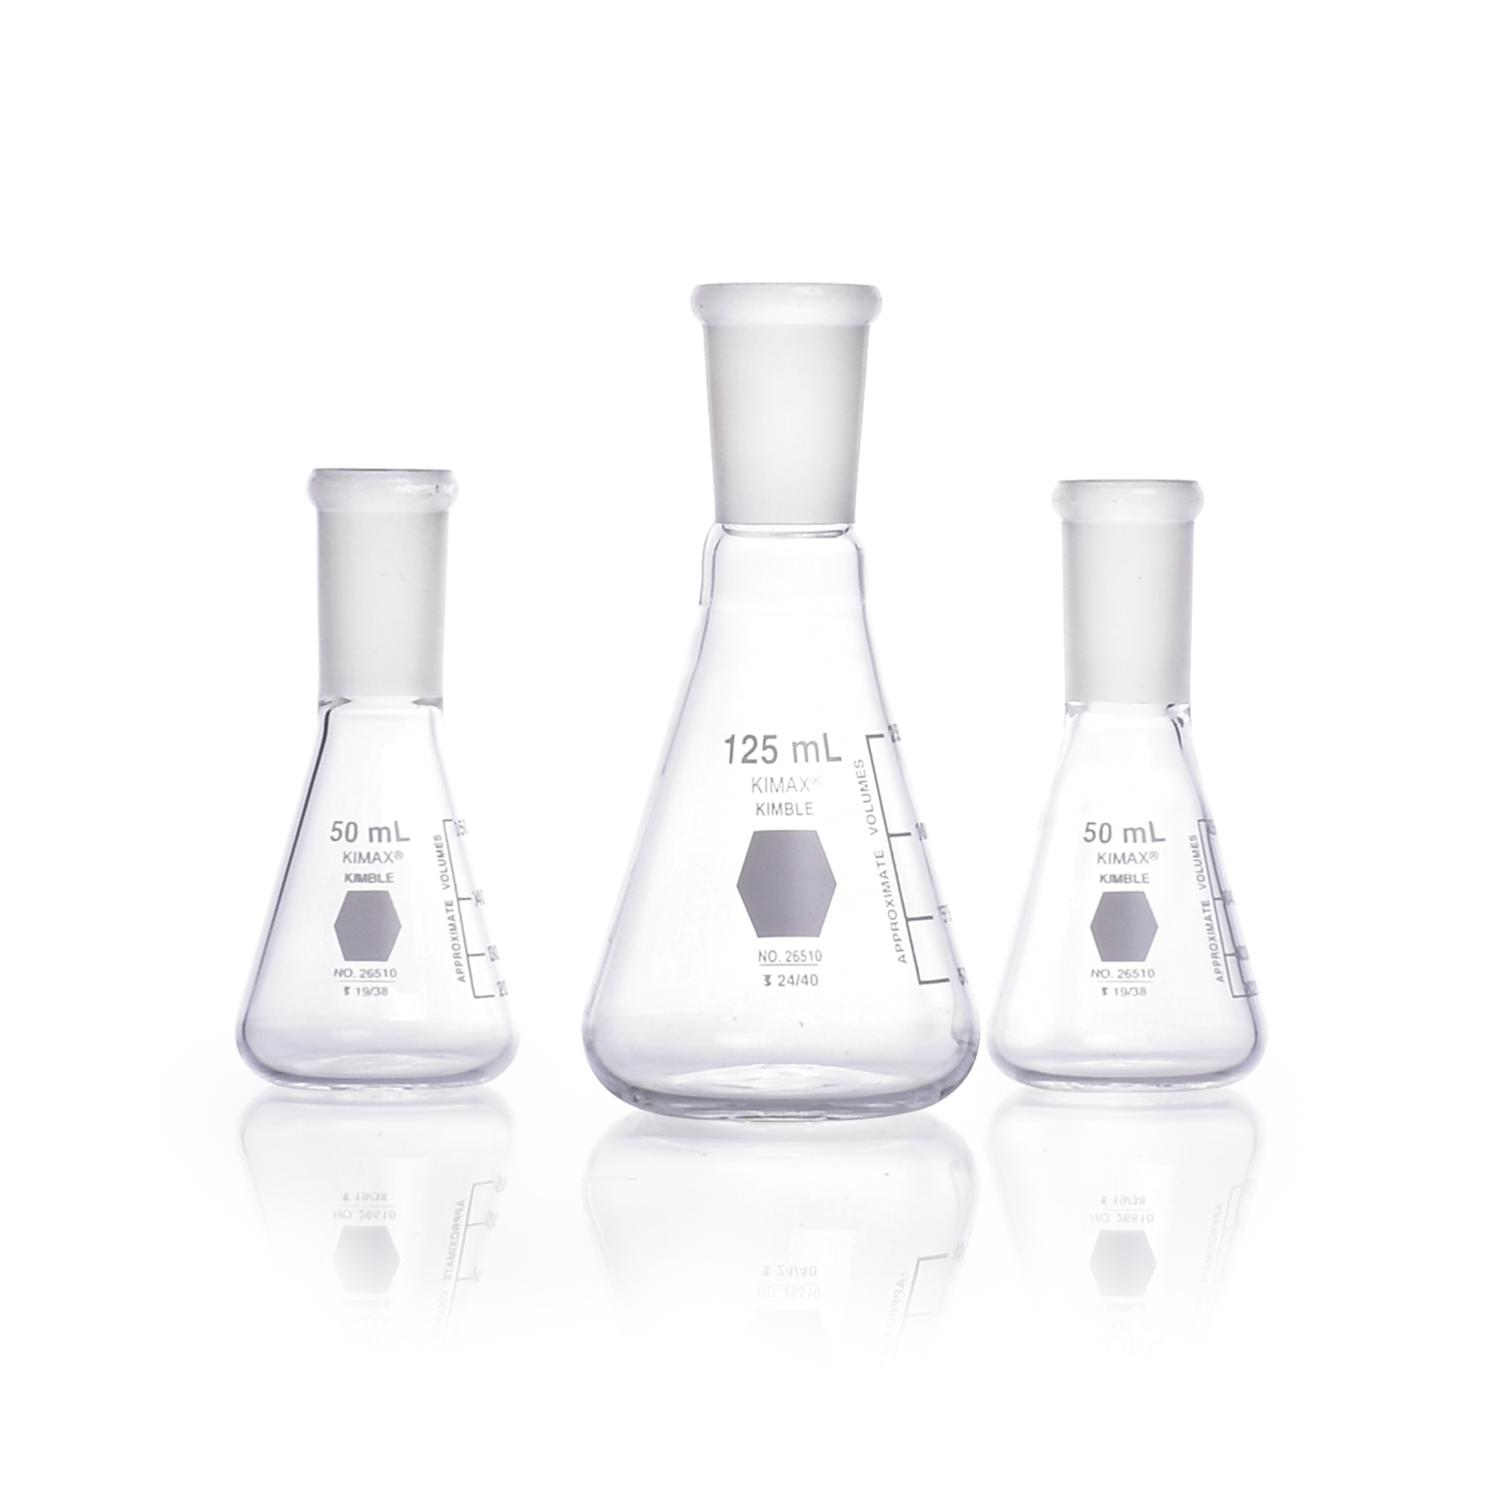 KIMBLE® KIMAX® Jointed Erlenmeyer Flask, 24/40, 2000 mL